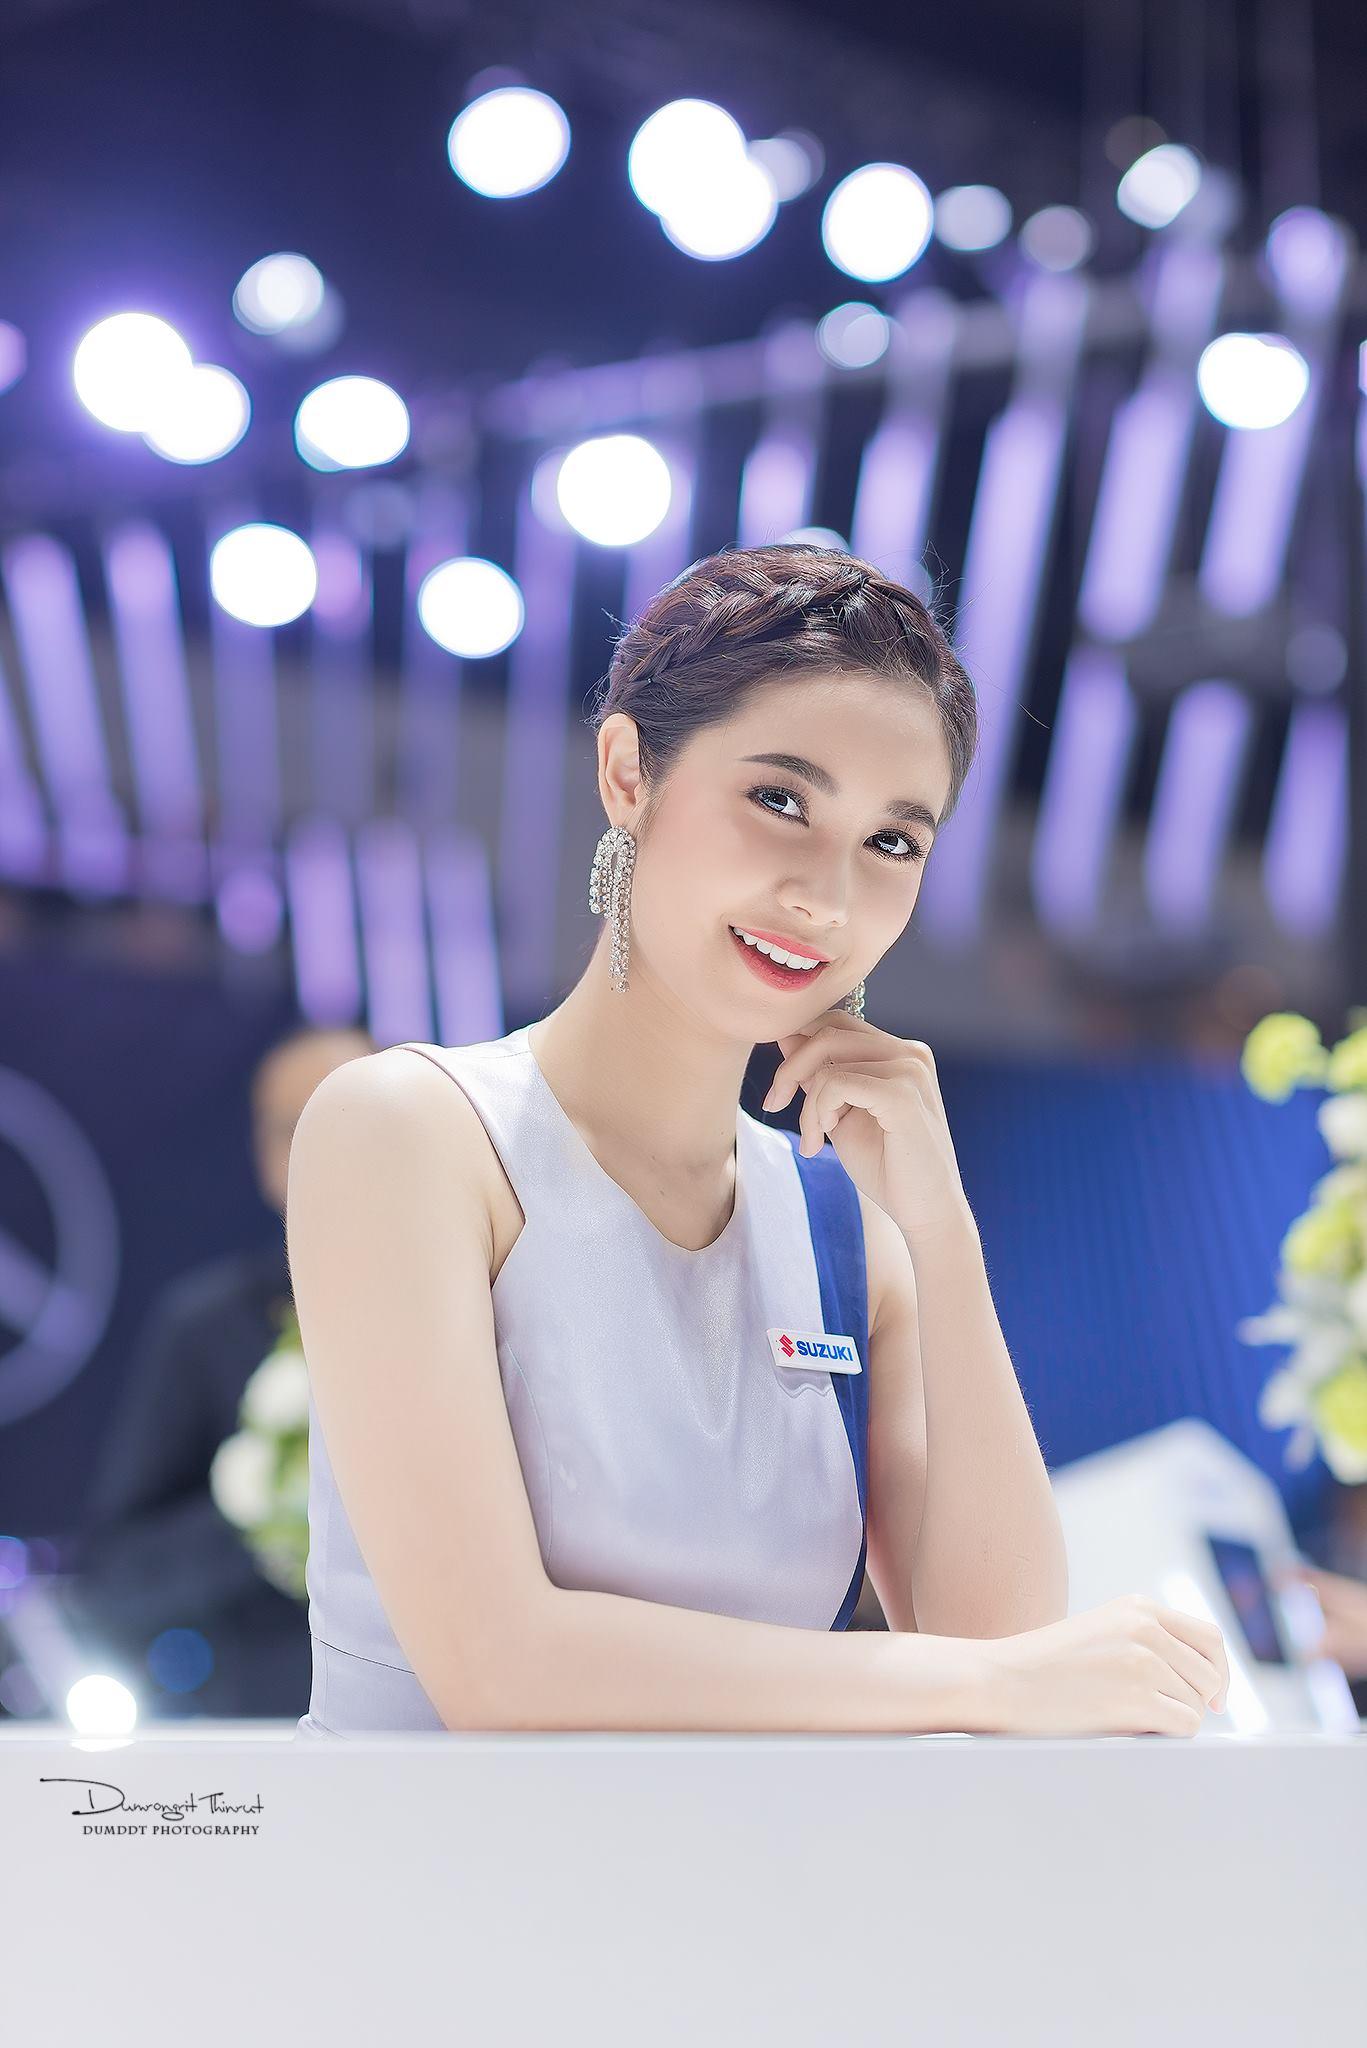 Thailand Motor Expo 2018 by Dumrongrit Dom Thinrut